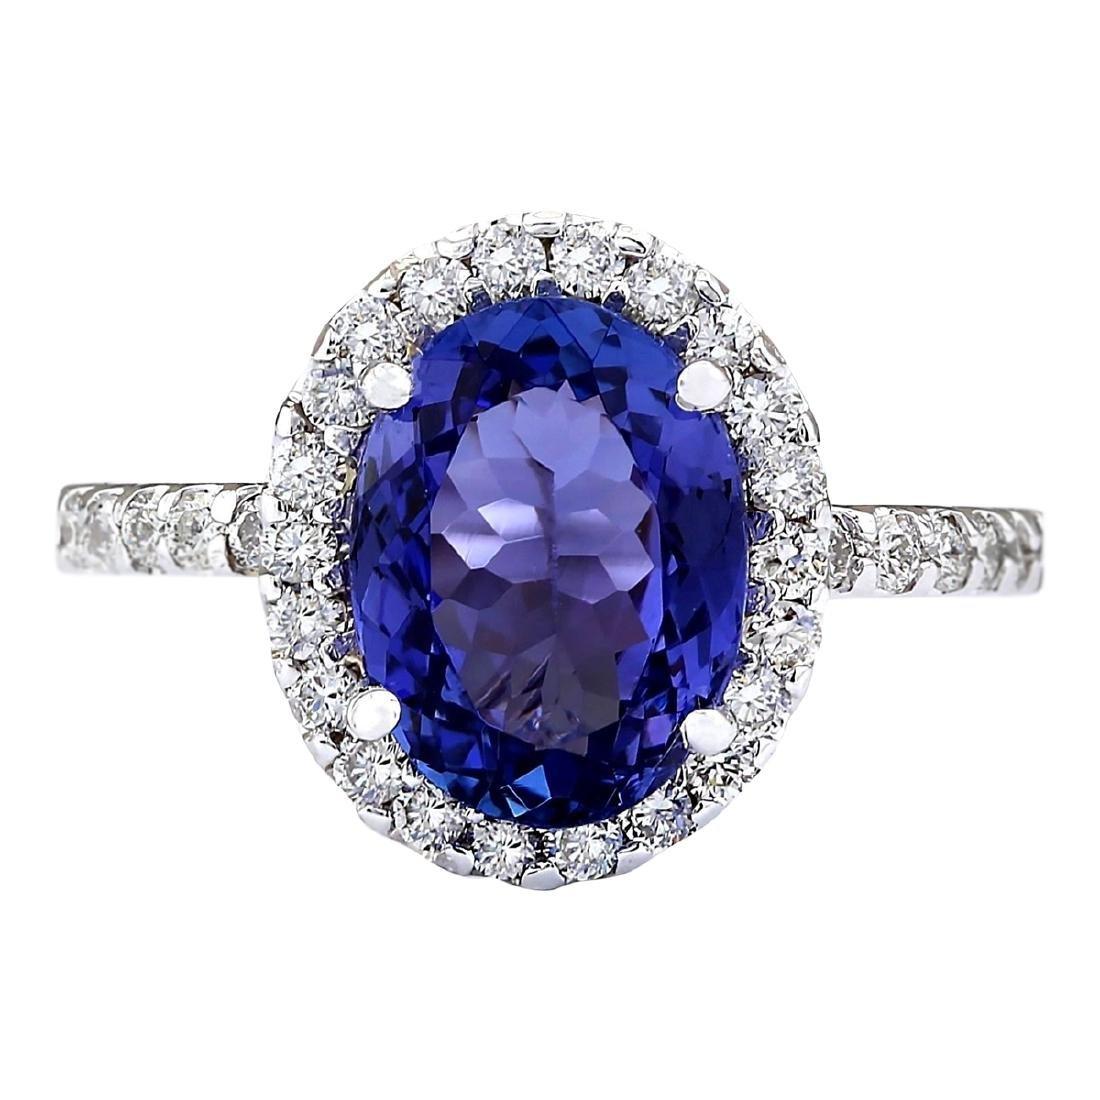 3.63 CTW Natural Blue Tanzanite And Diamond Ring 18K